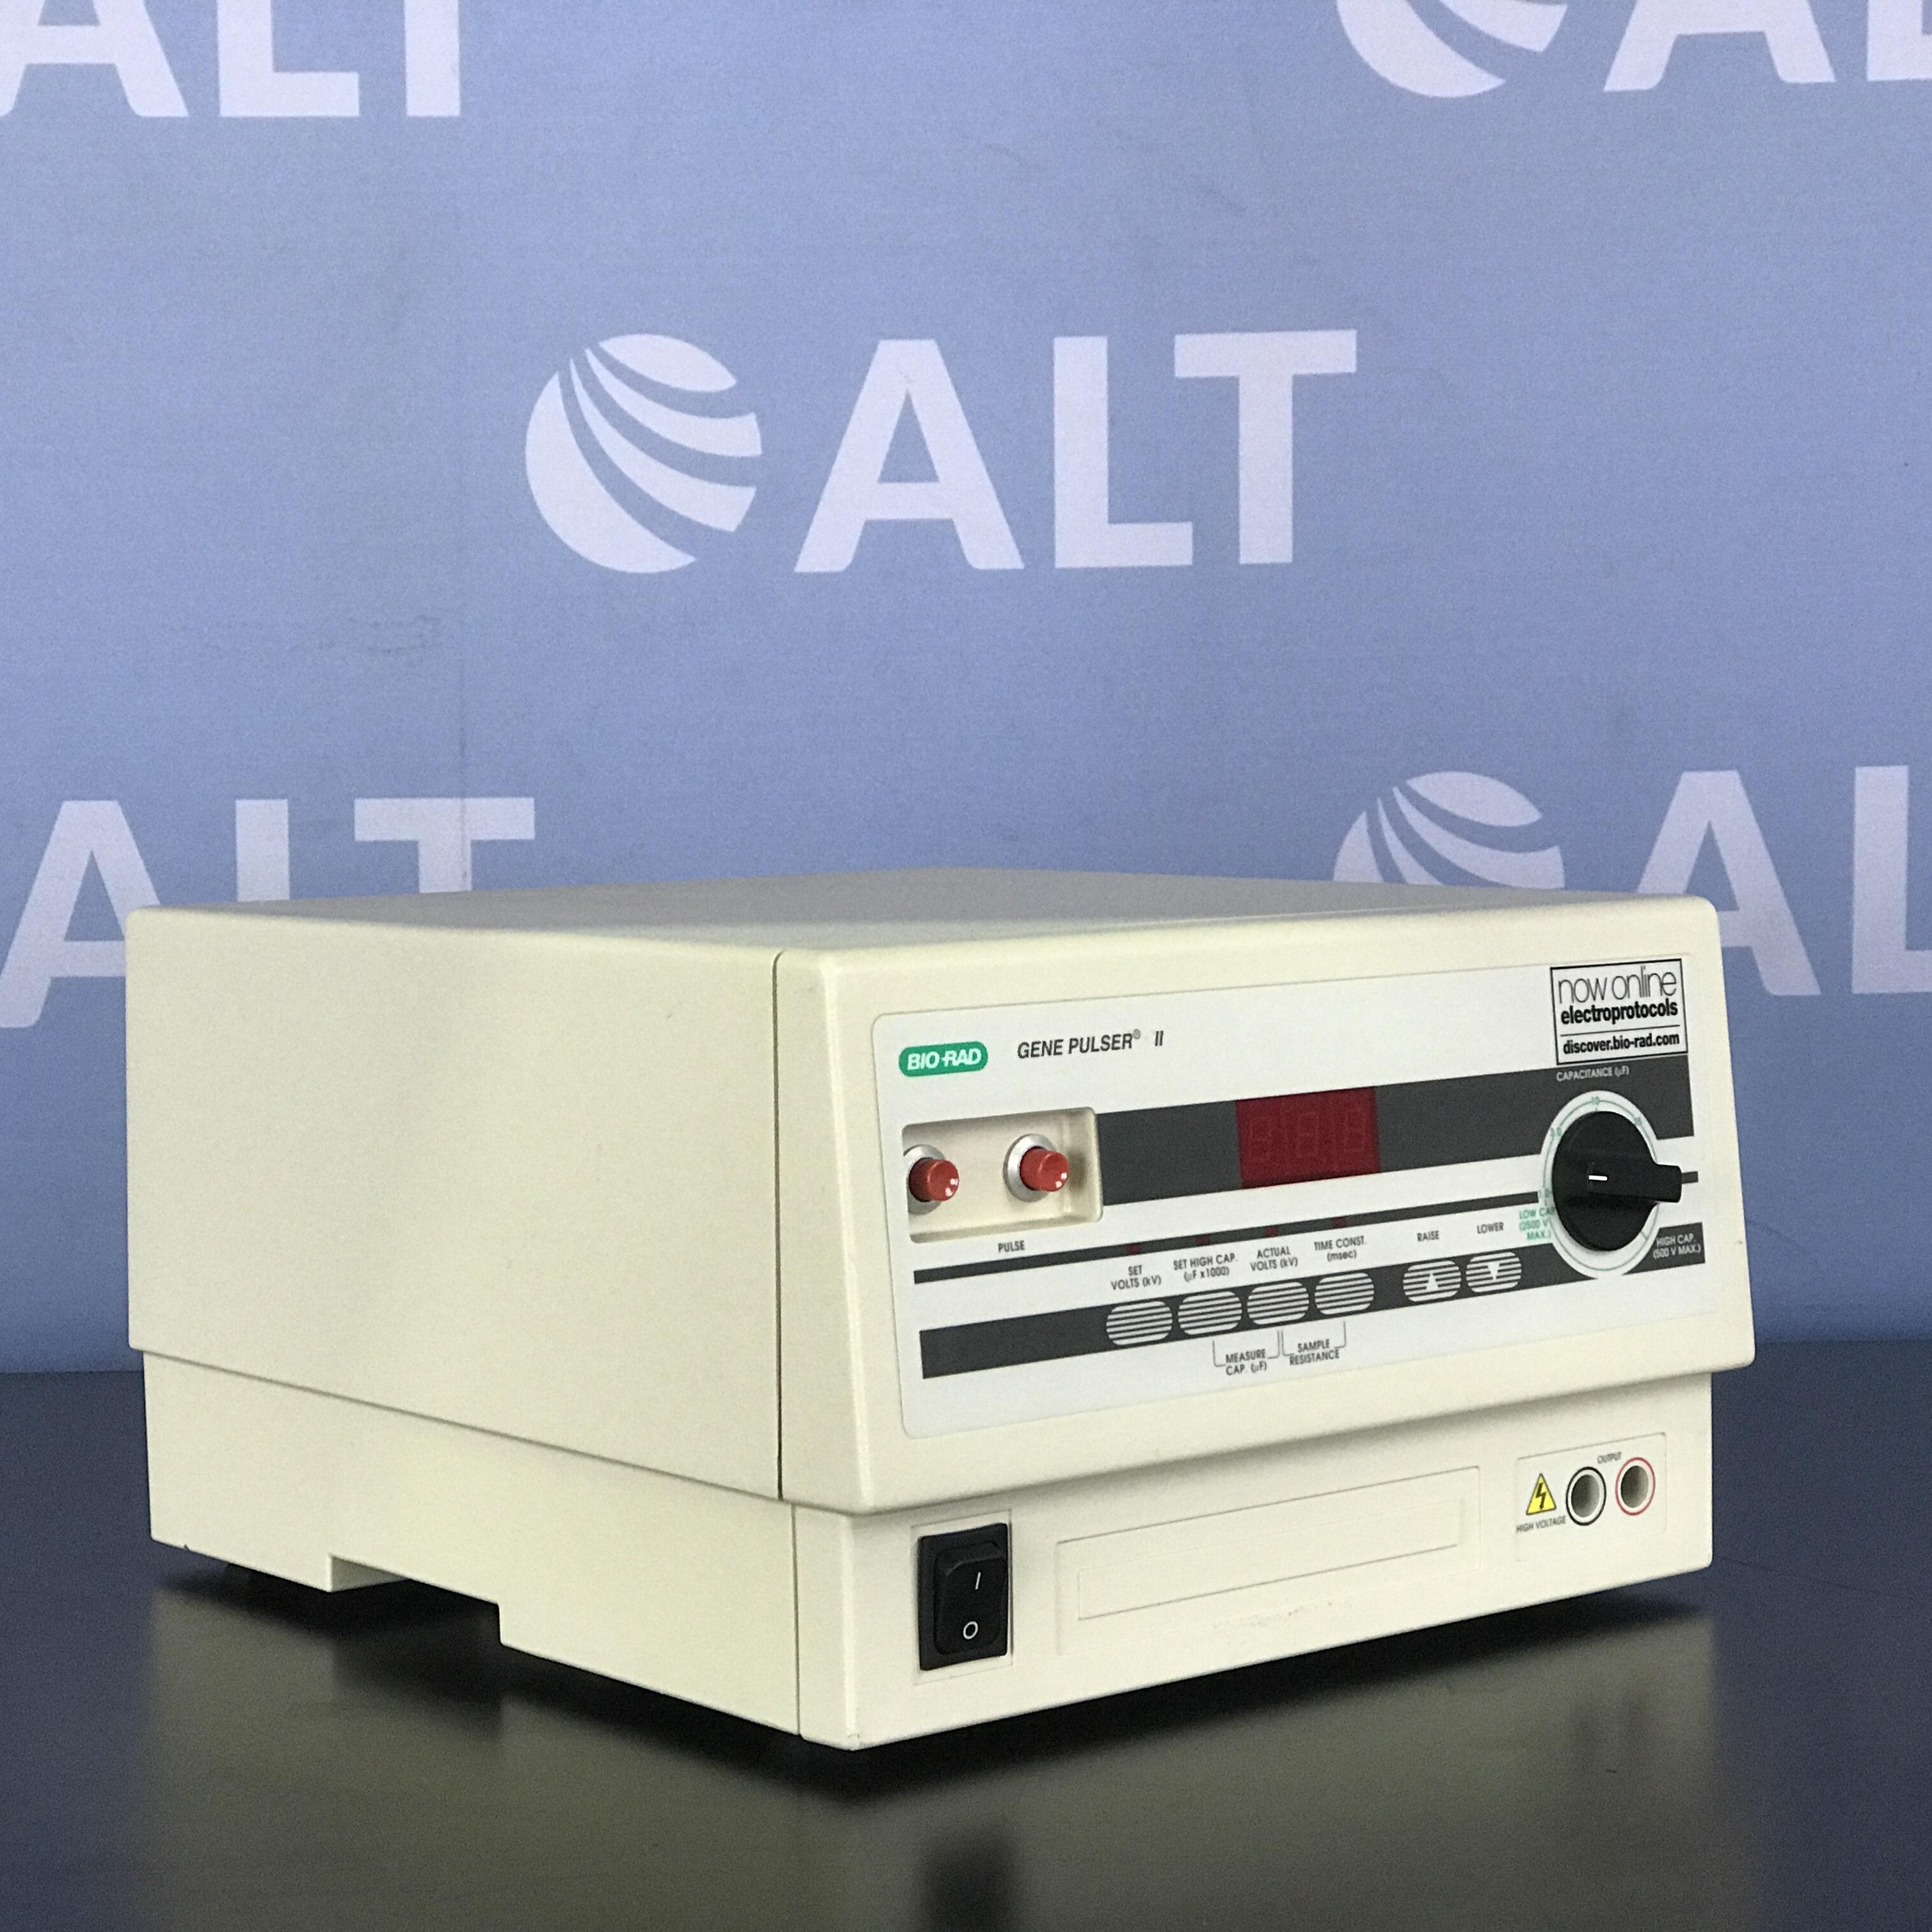 Bio-Rad Gene Pulser II Apparatus Image